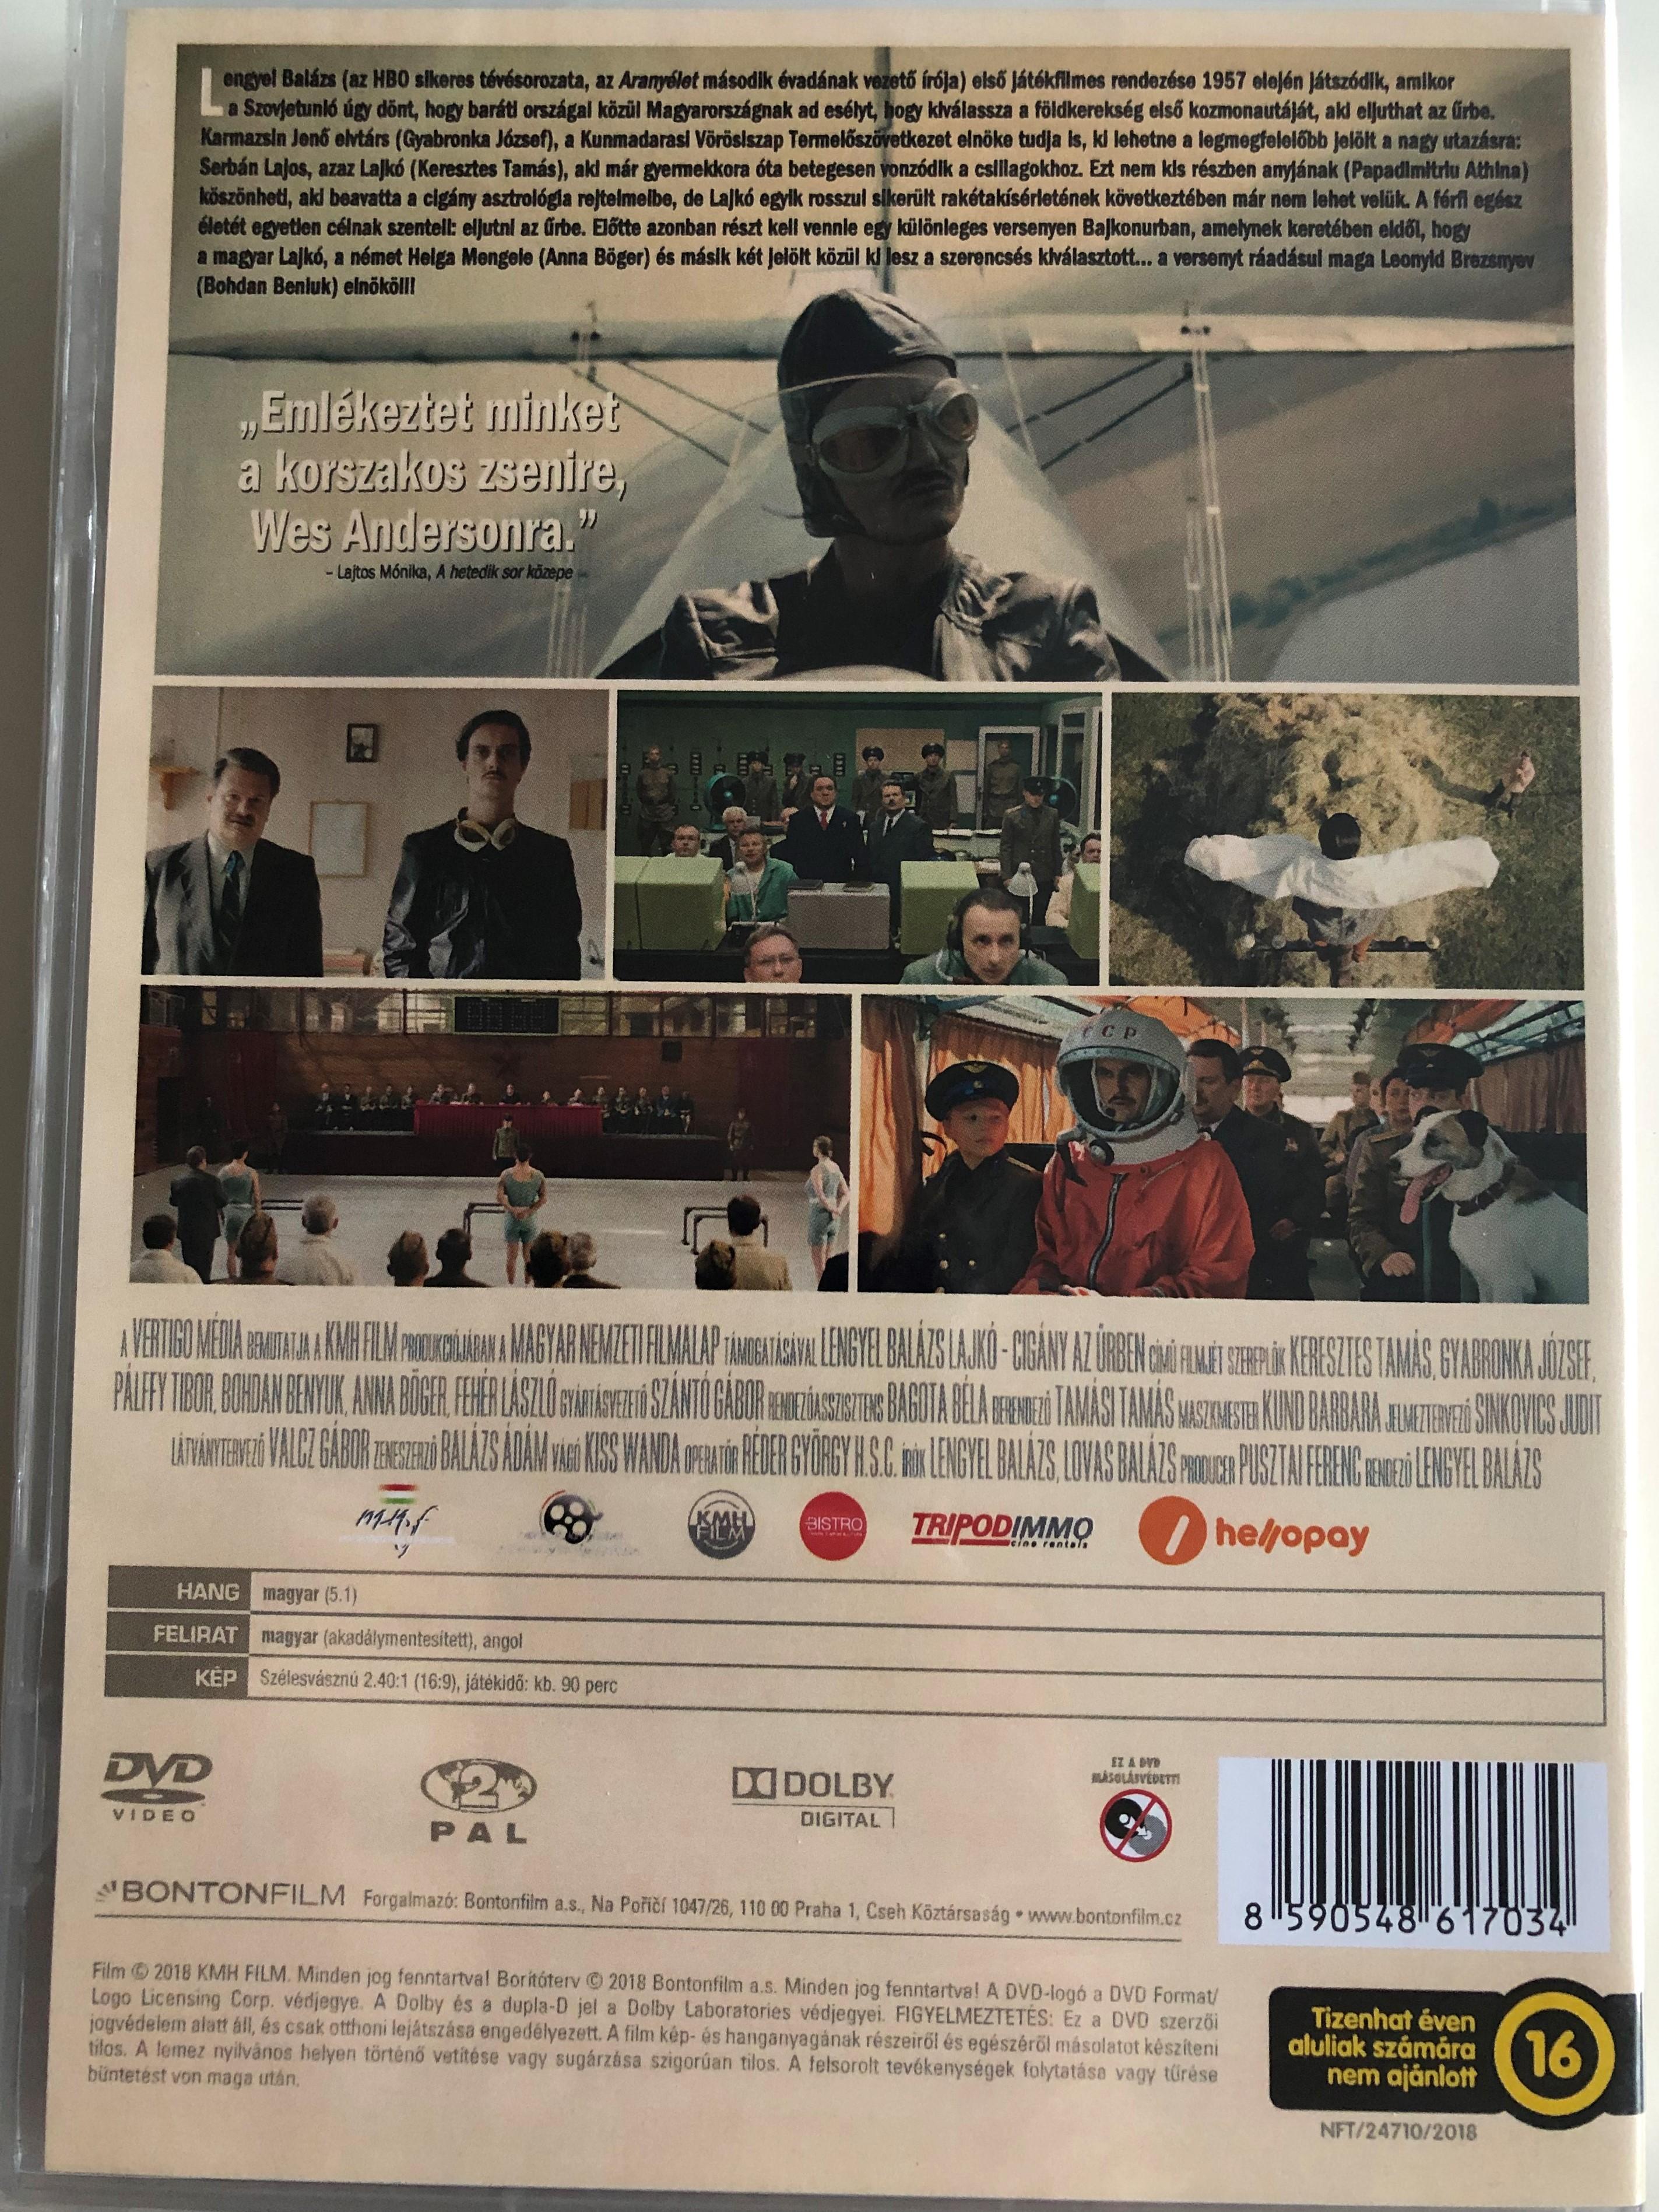 lajk-cig-ny-az-rben-dvd-2018-directed-by-lengyel-bal-zs-2-.jpg